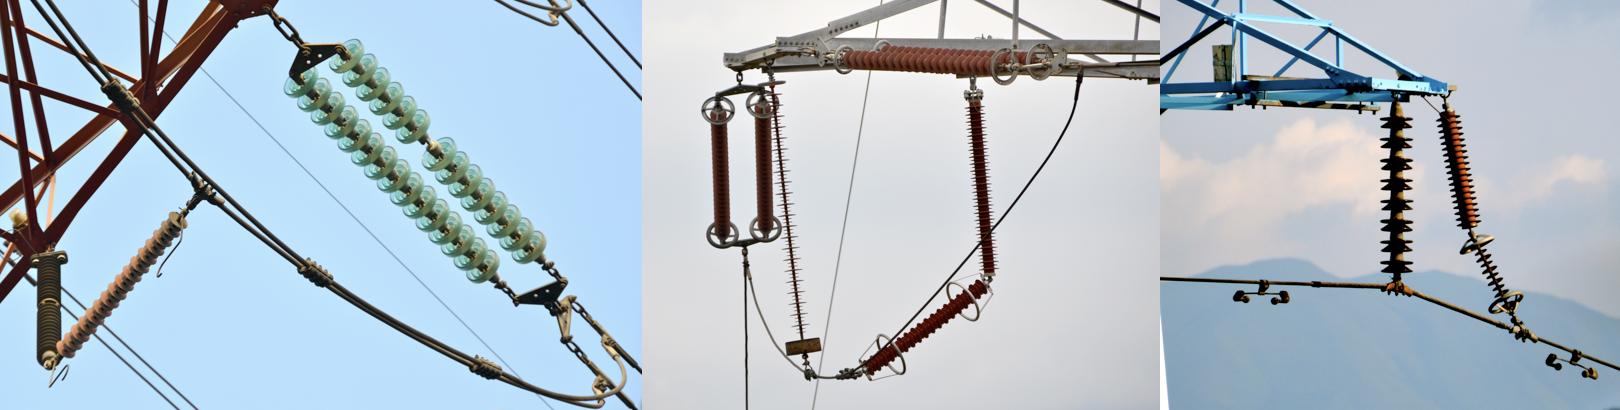 line arrester Utility Reduced Lightning Outages with Line Arrester Investment Program Examples of EGLA